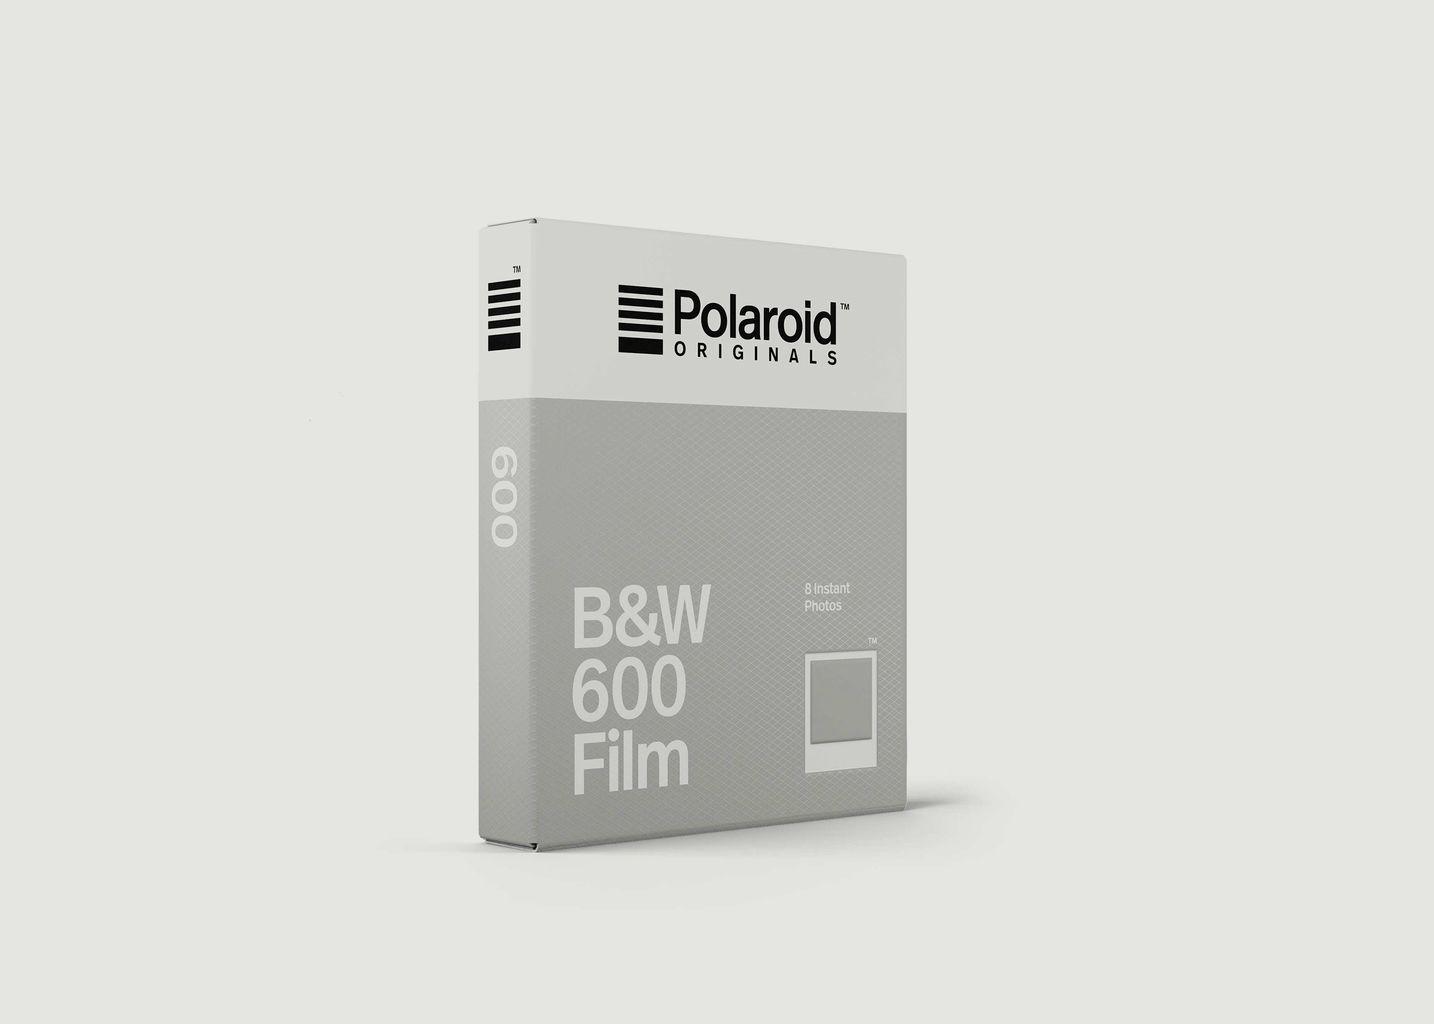 Instant Film - B&W Film pour 600 Noir & Blanc - Polaroid Originals